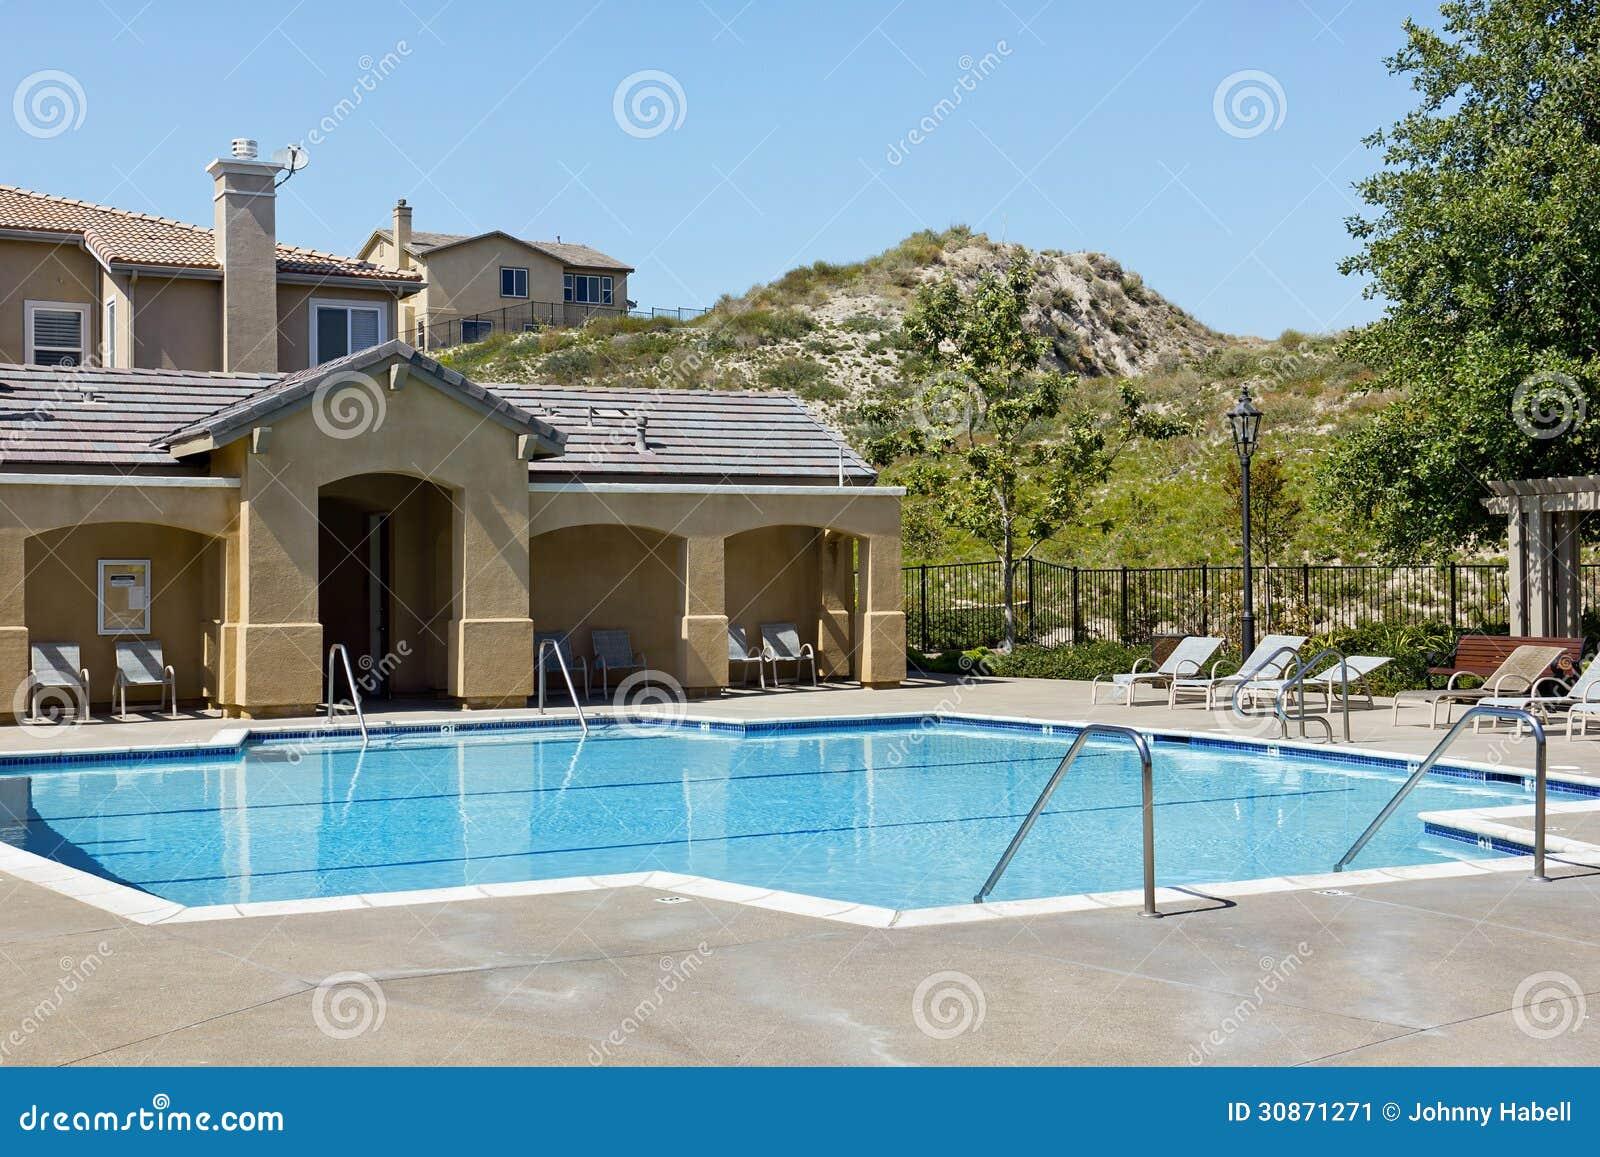 Community Swimming Pool Royalty Free Stock Image 53528830